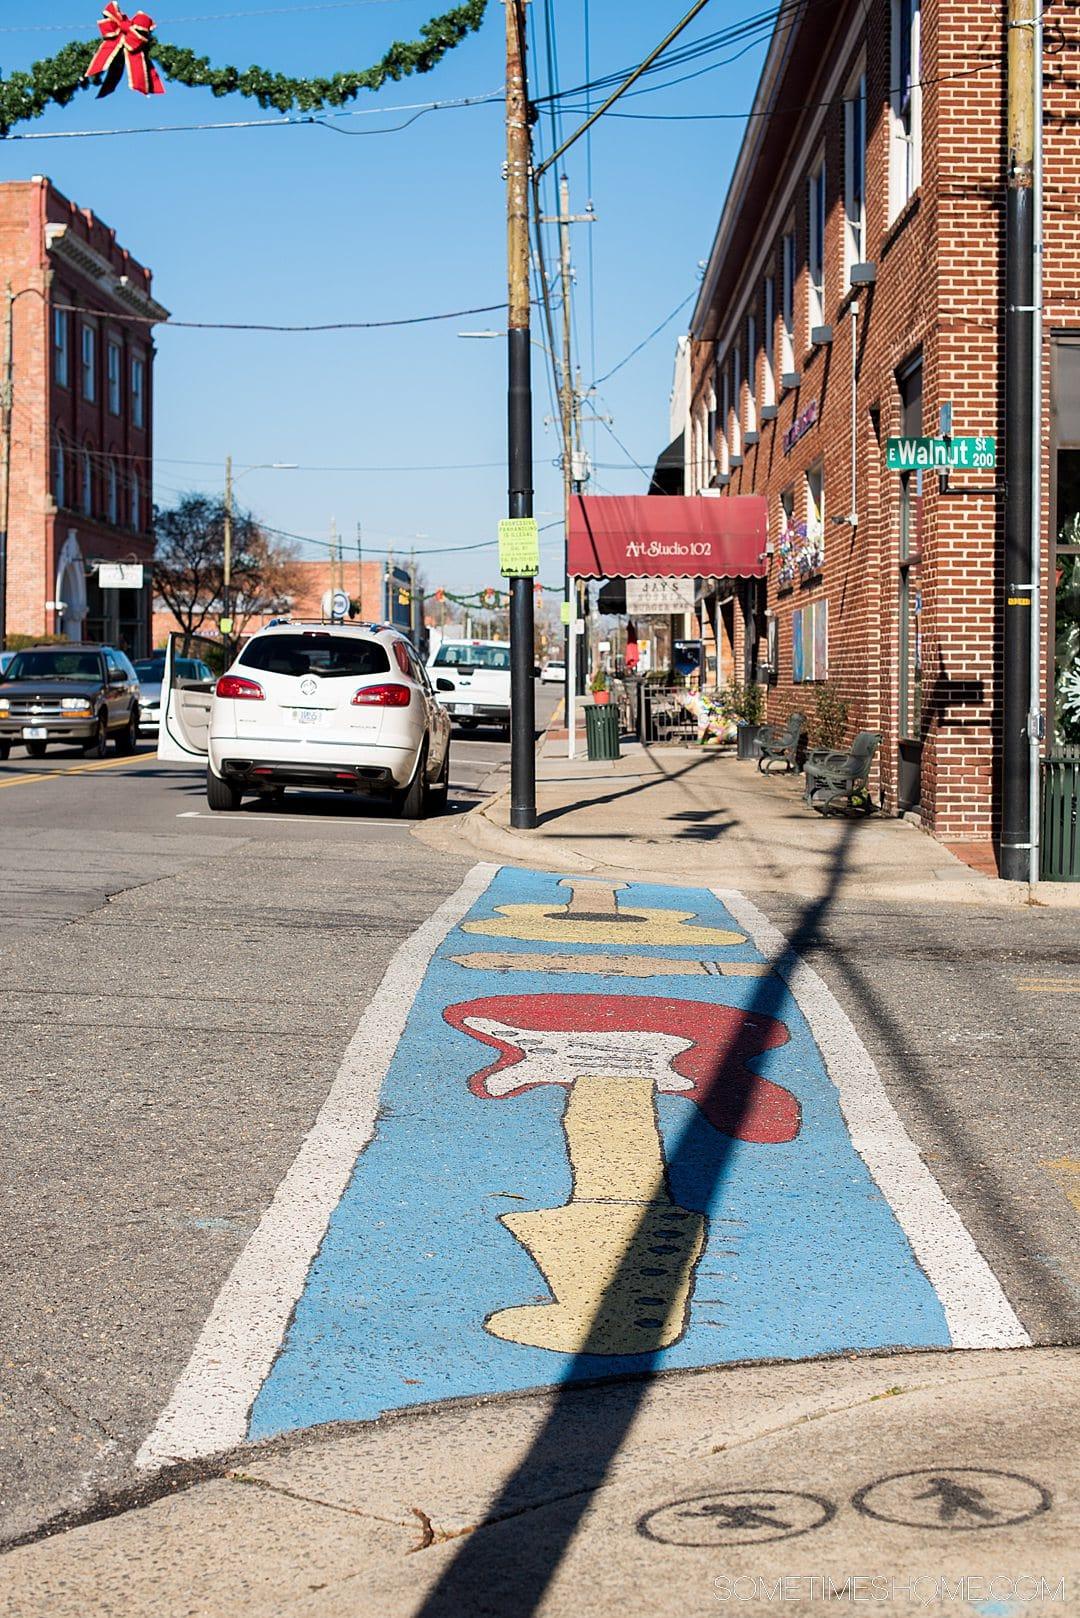 Guitar painted in a crosswalk